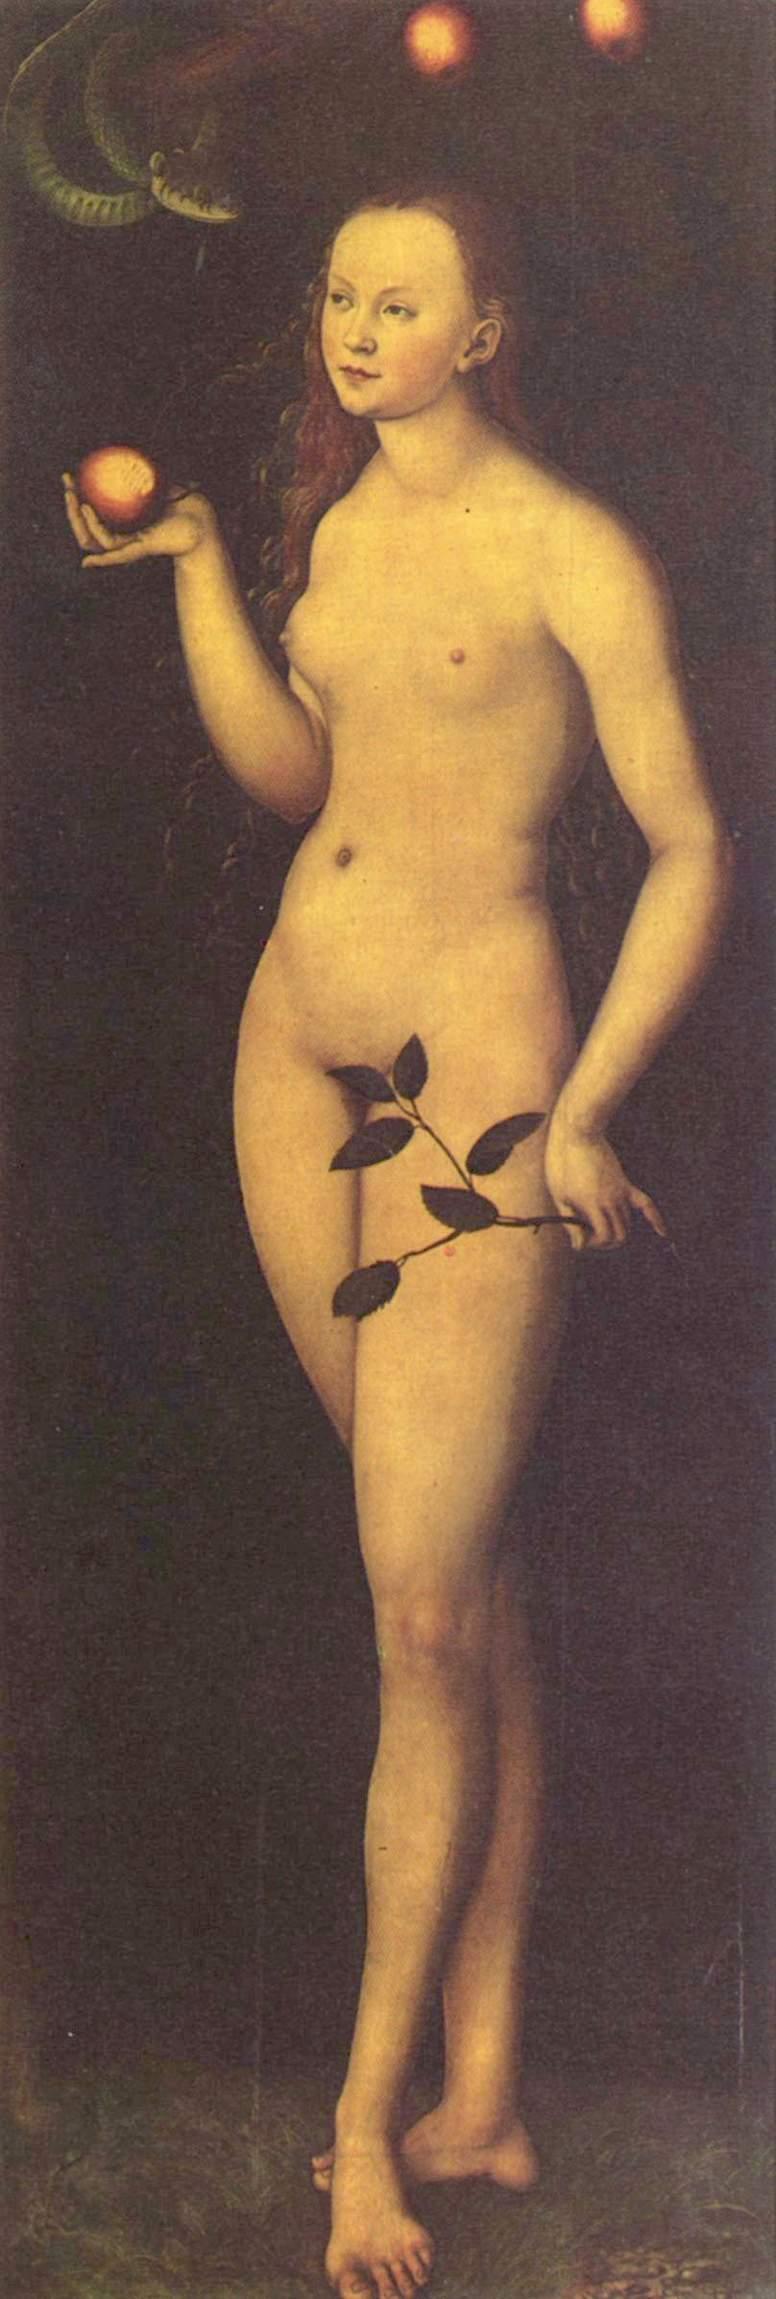 Eva by Lucas Cranach the Elder (1528)